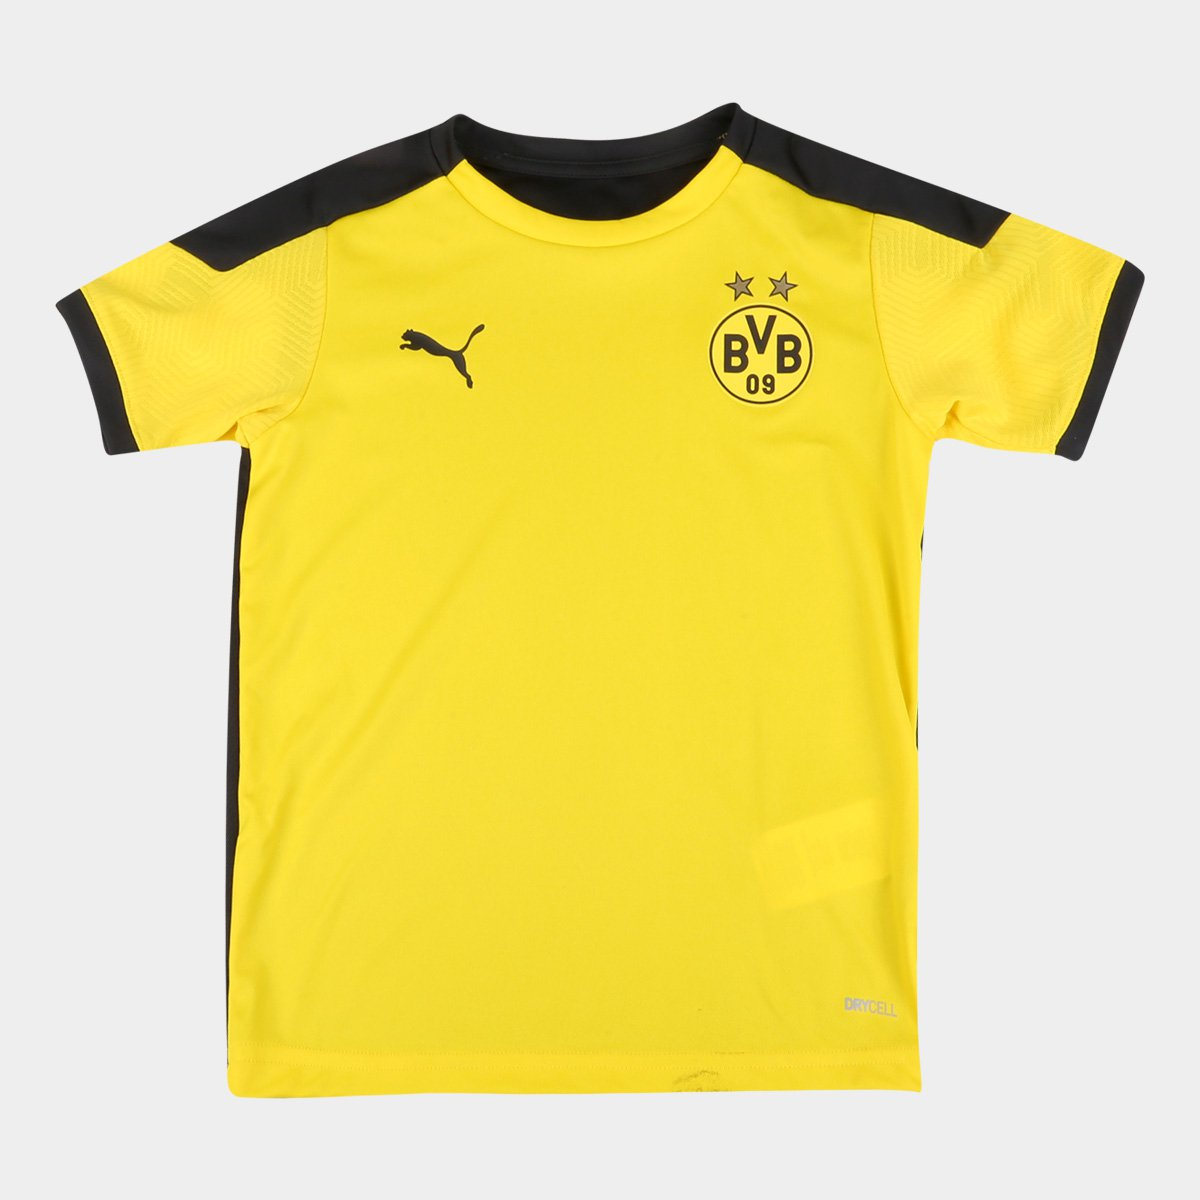 Camisa Borussia Dortmund Juvenil Treino 20/21 Puma